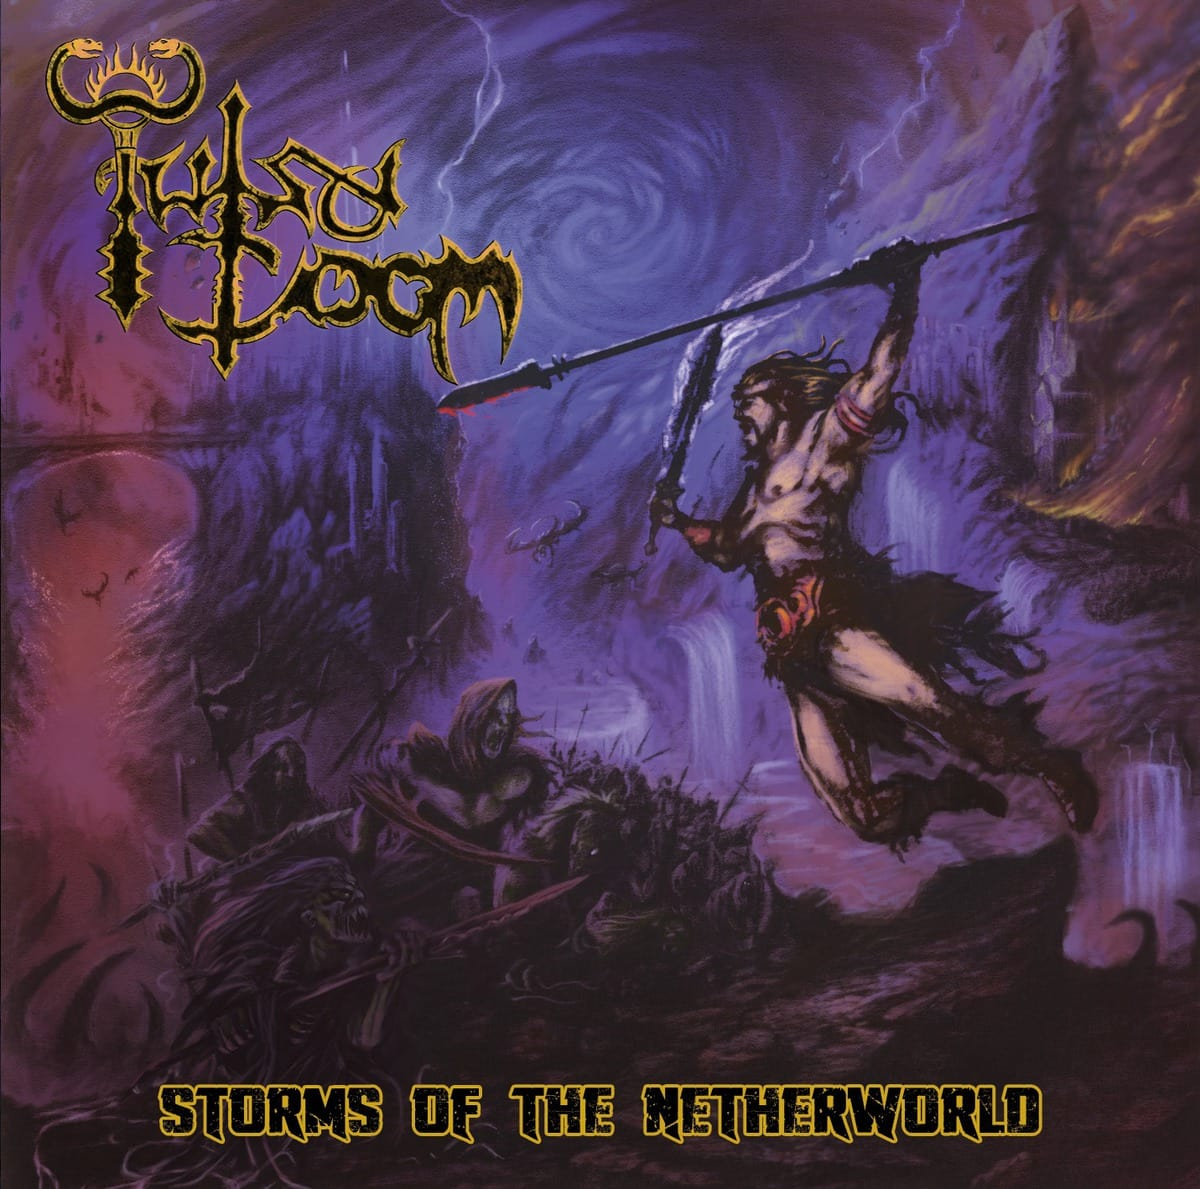 TULSADOOM (AUT) – Storms of the netherworld, 2015